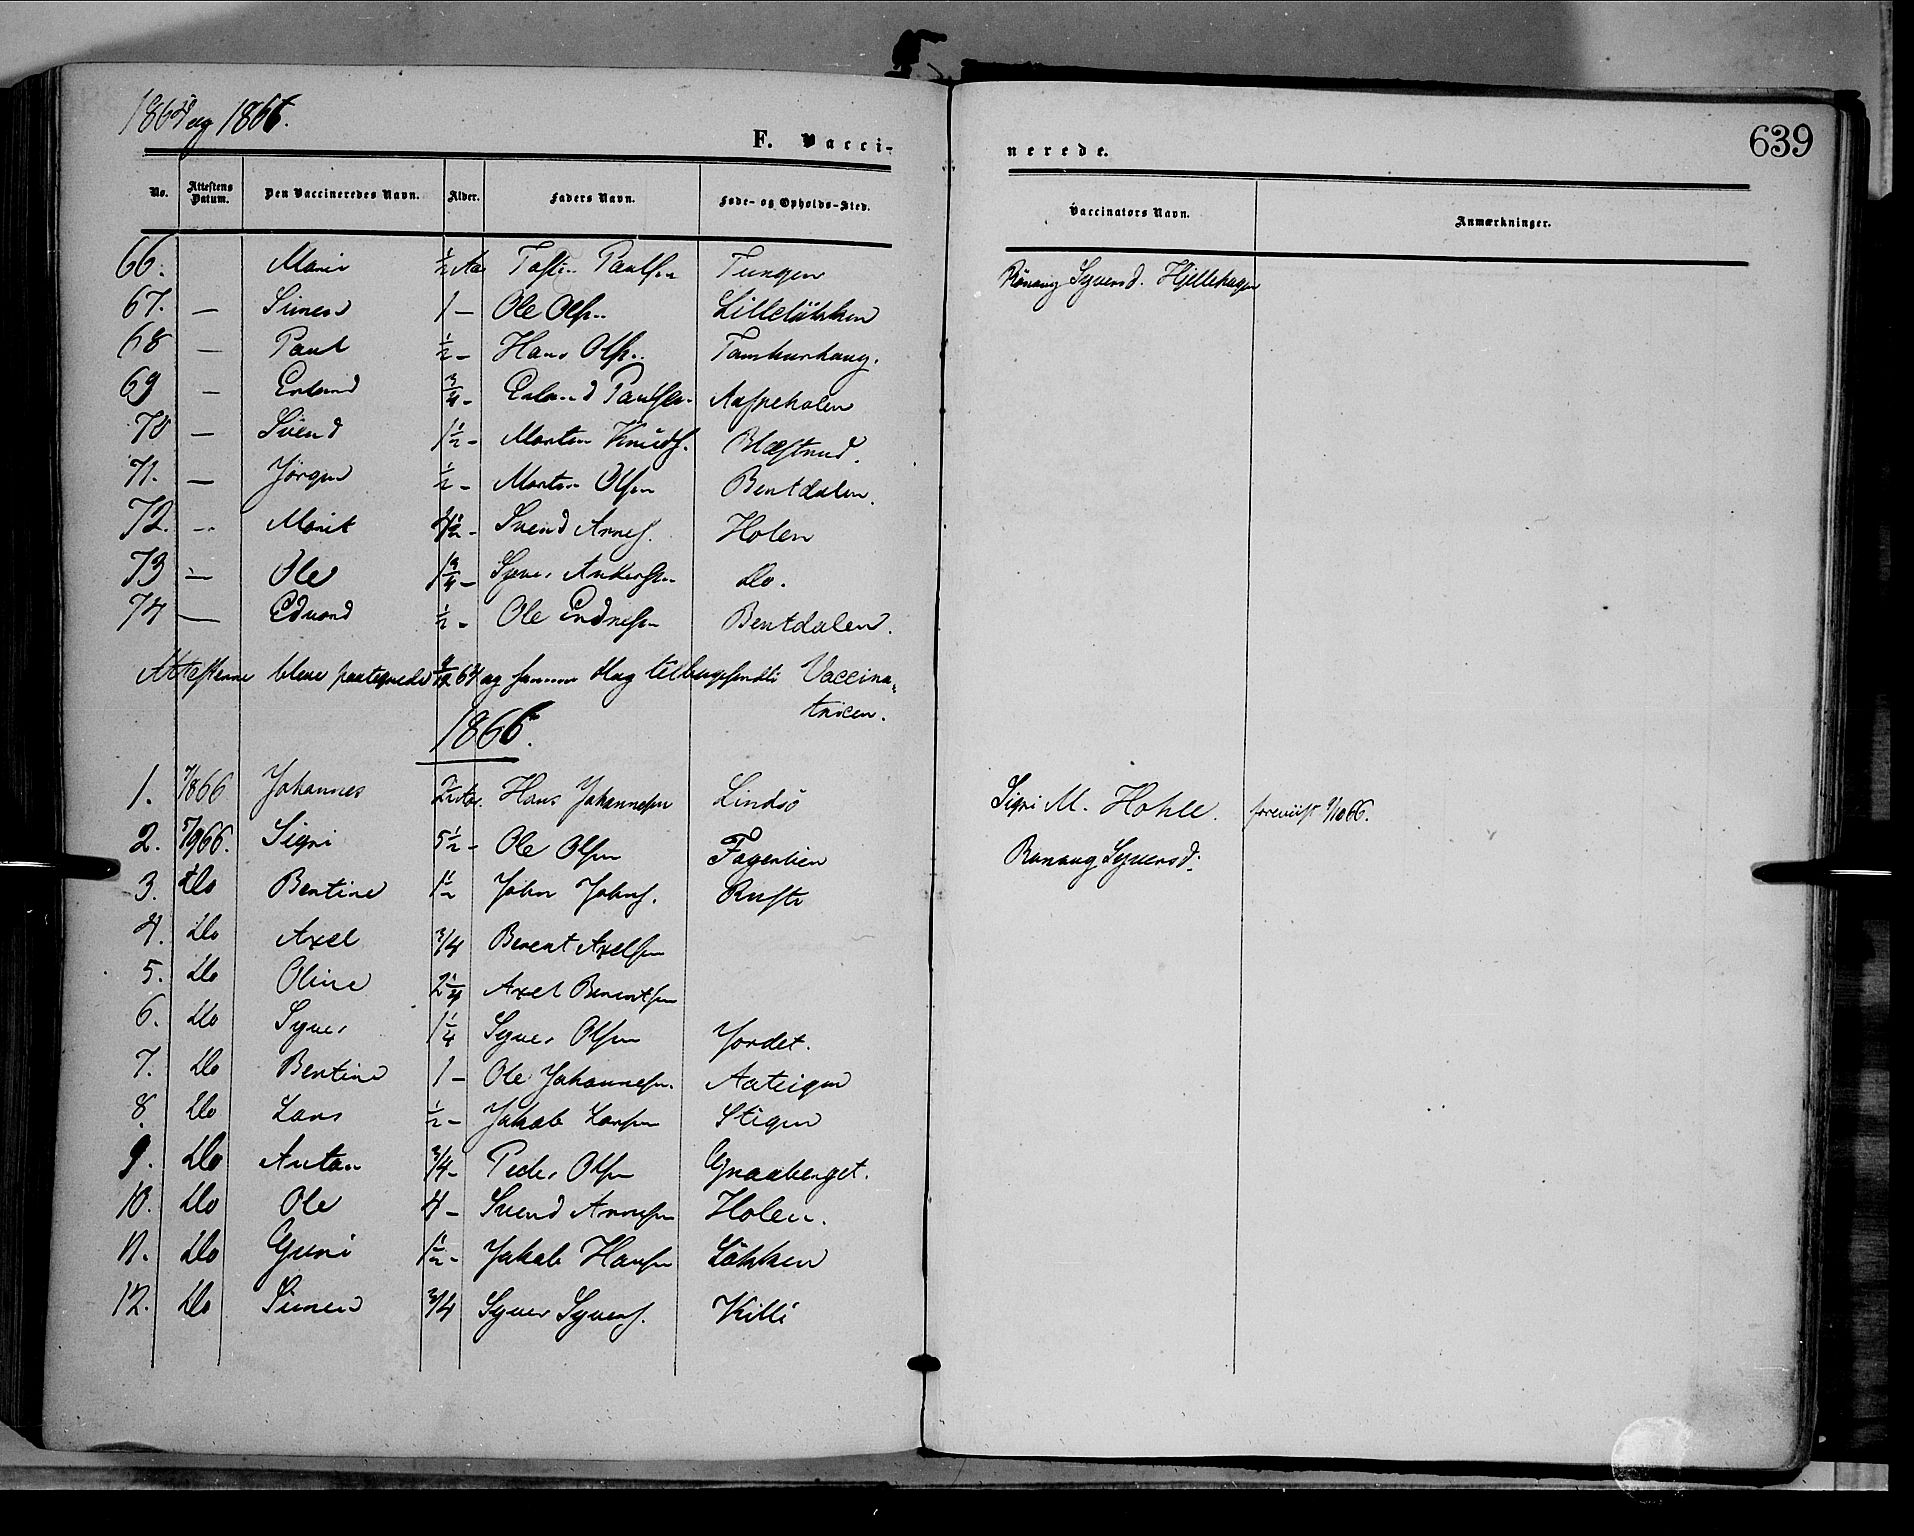 SAH, Dovre prestekontor, Ministerialbok nr. 1, 1854-1878, s. 639